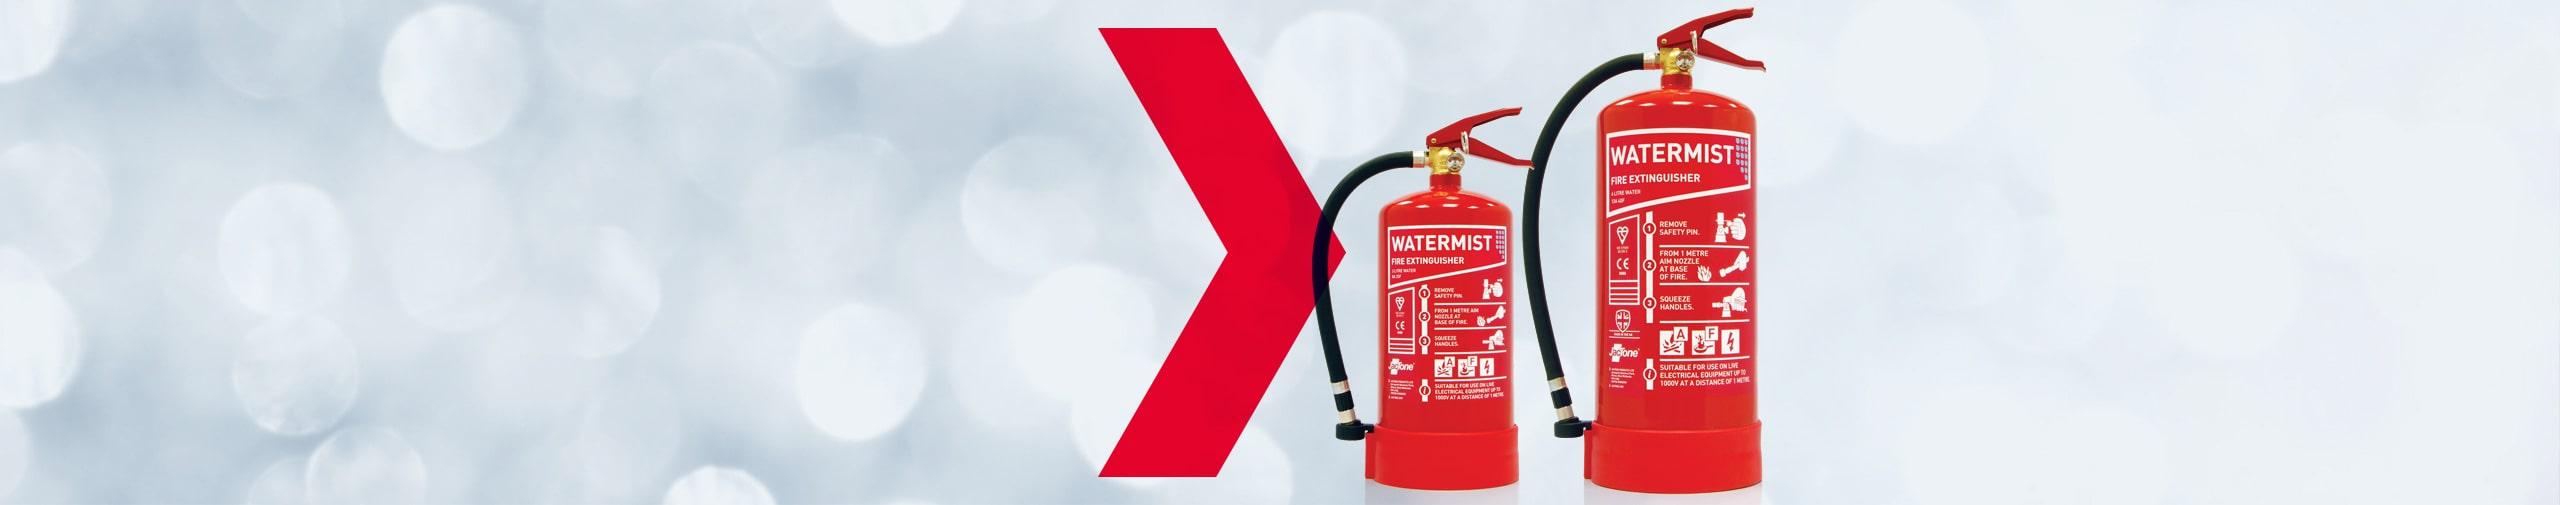 Jactone Water Mist Fire Extinguishers